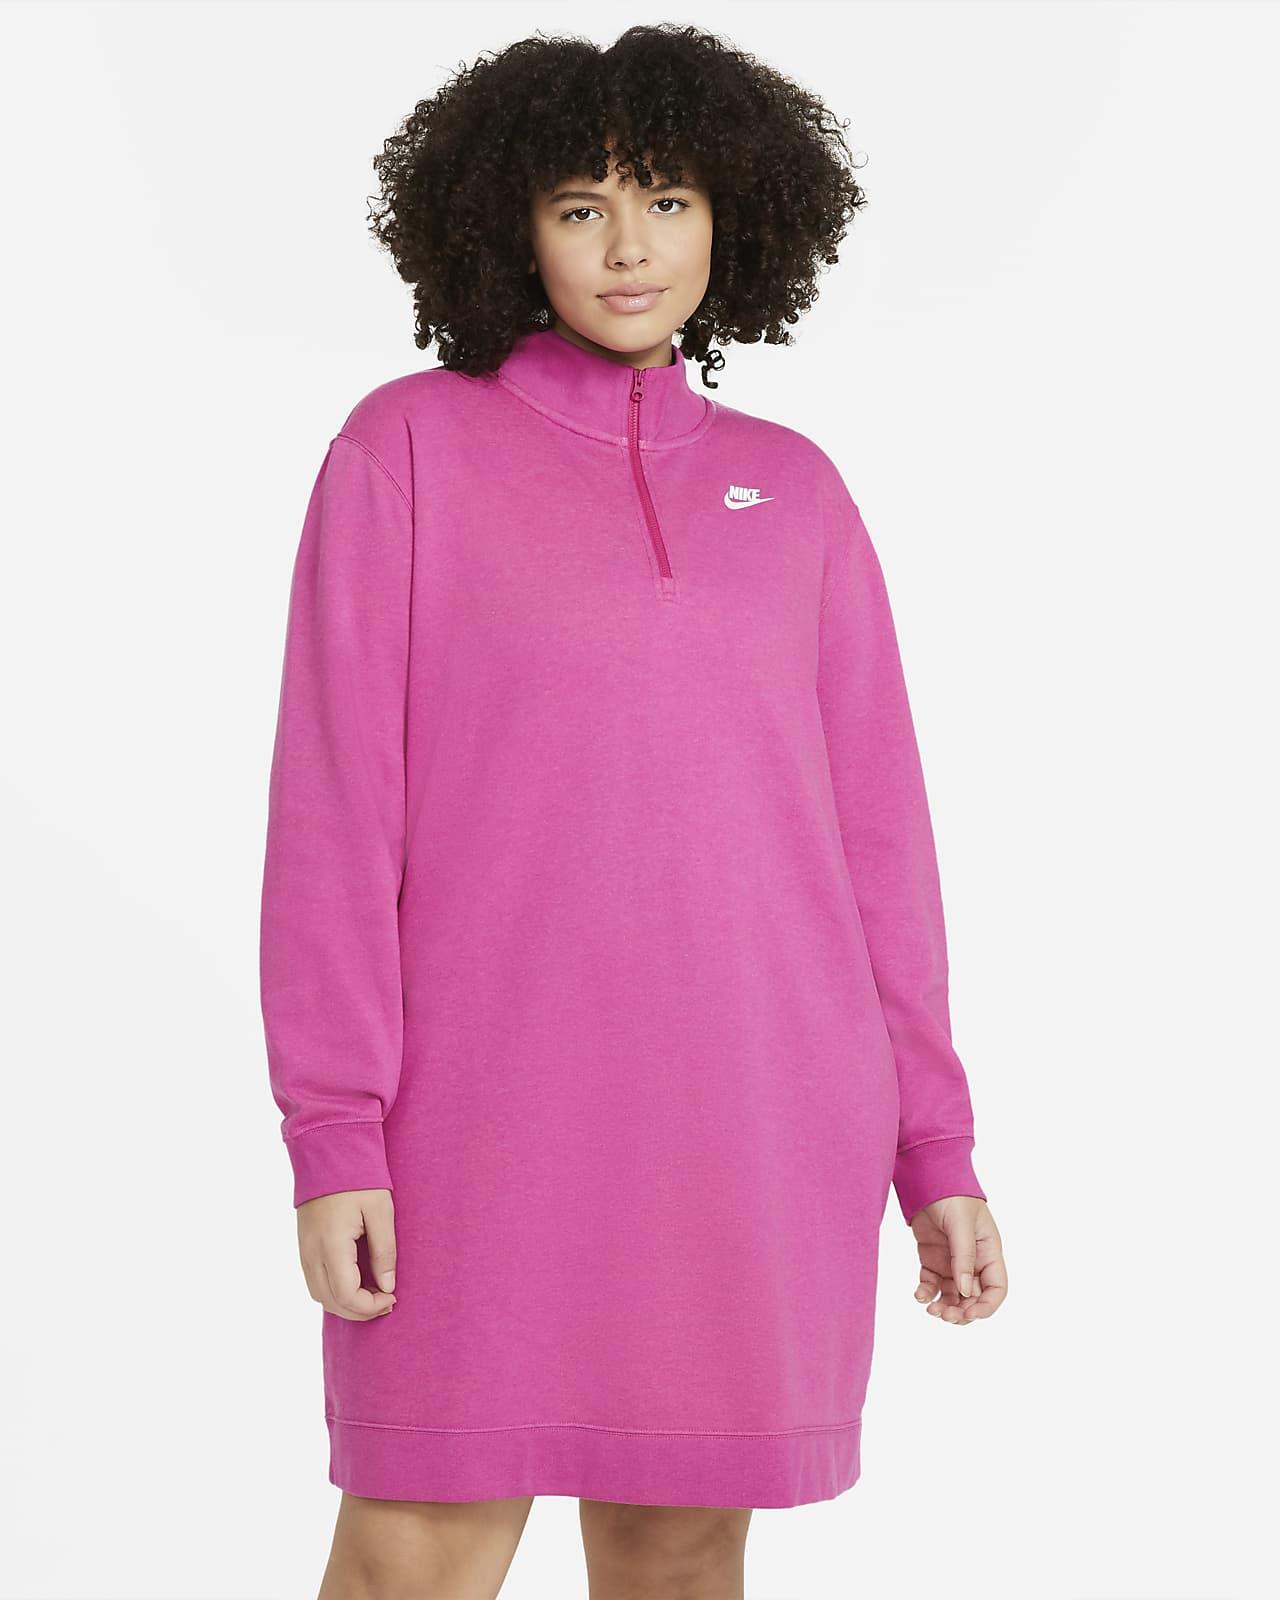 Vestido de tejido fleece para mujer (talla grande) Nike Sportswear Club